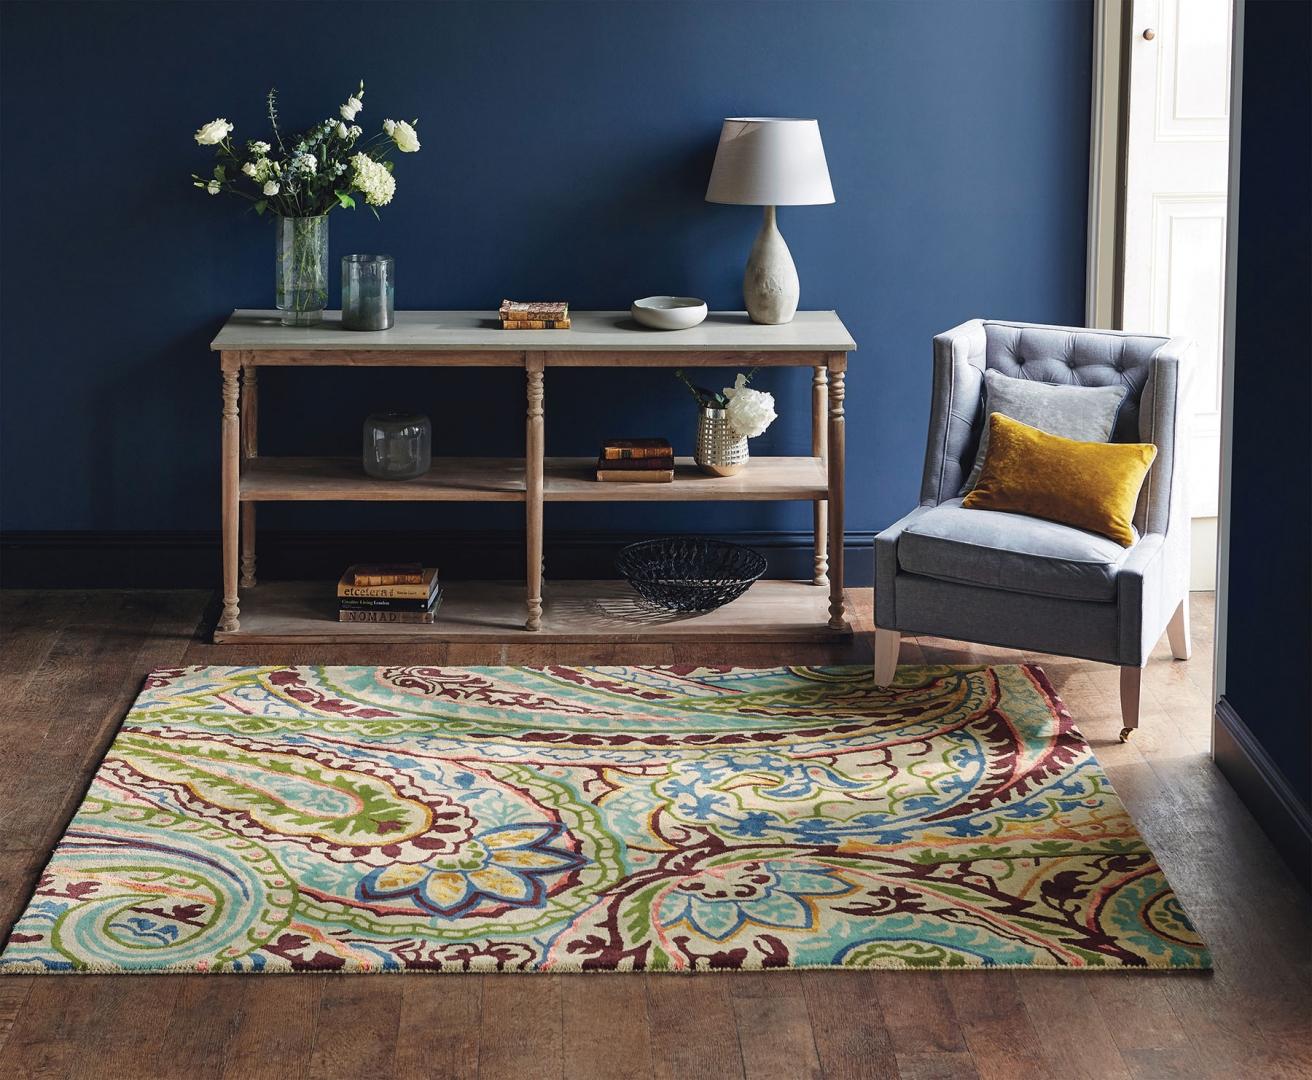 dywany vintage we wn trzach meubles de charme. Black Bedroom Furniture Sets. Home Design Ideas